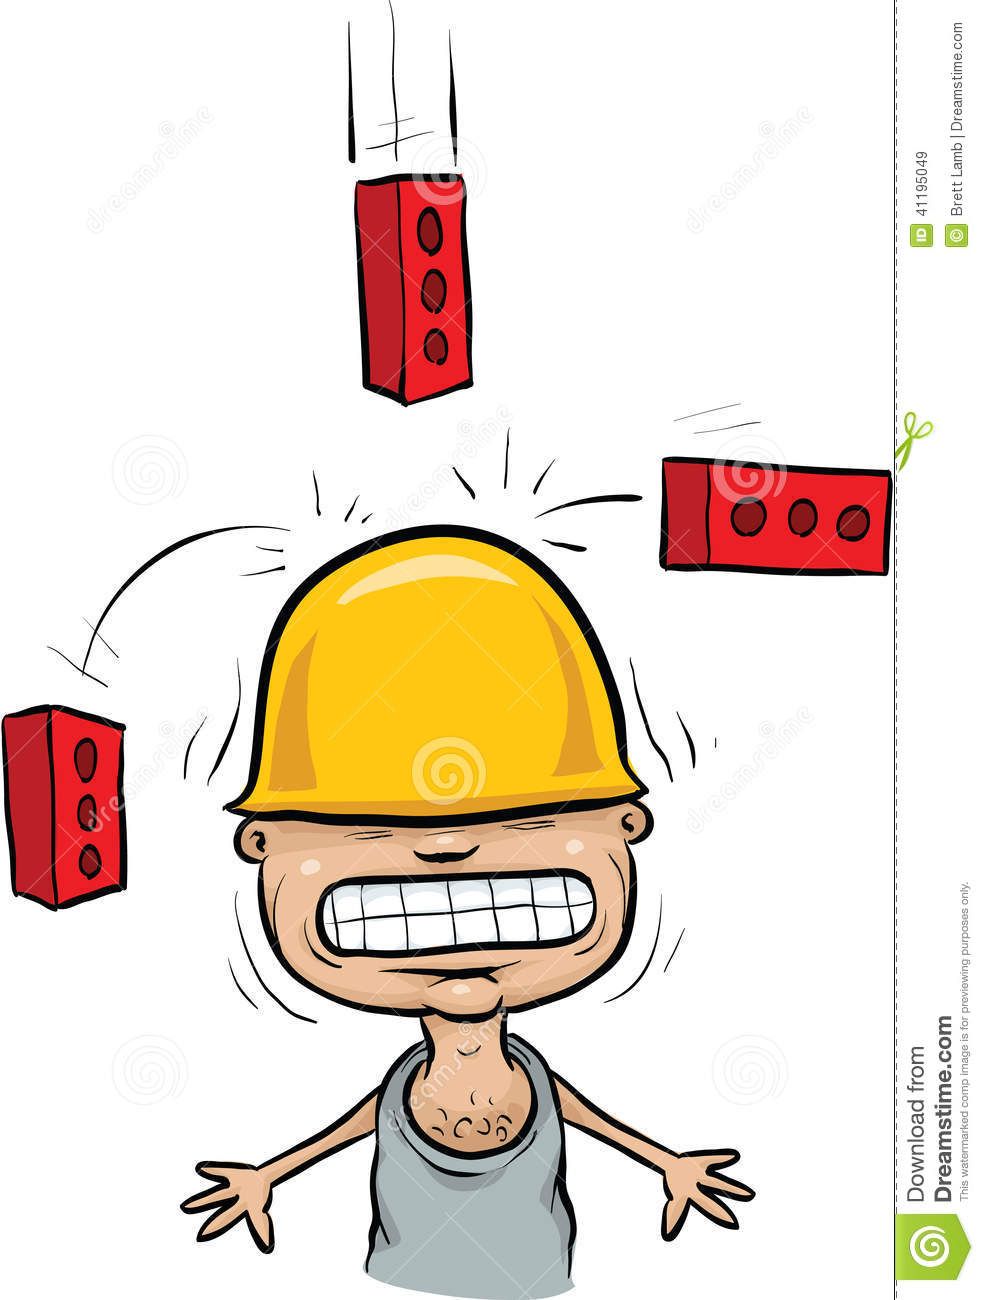 Falling Brick Accident Stock Illustration.